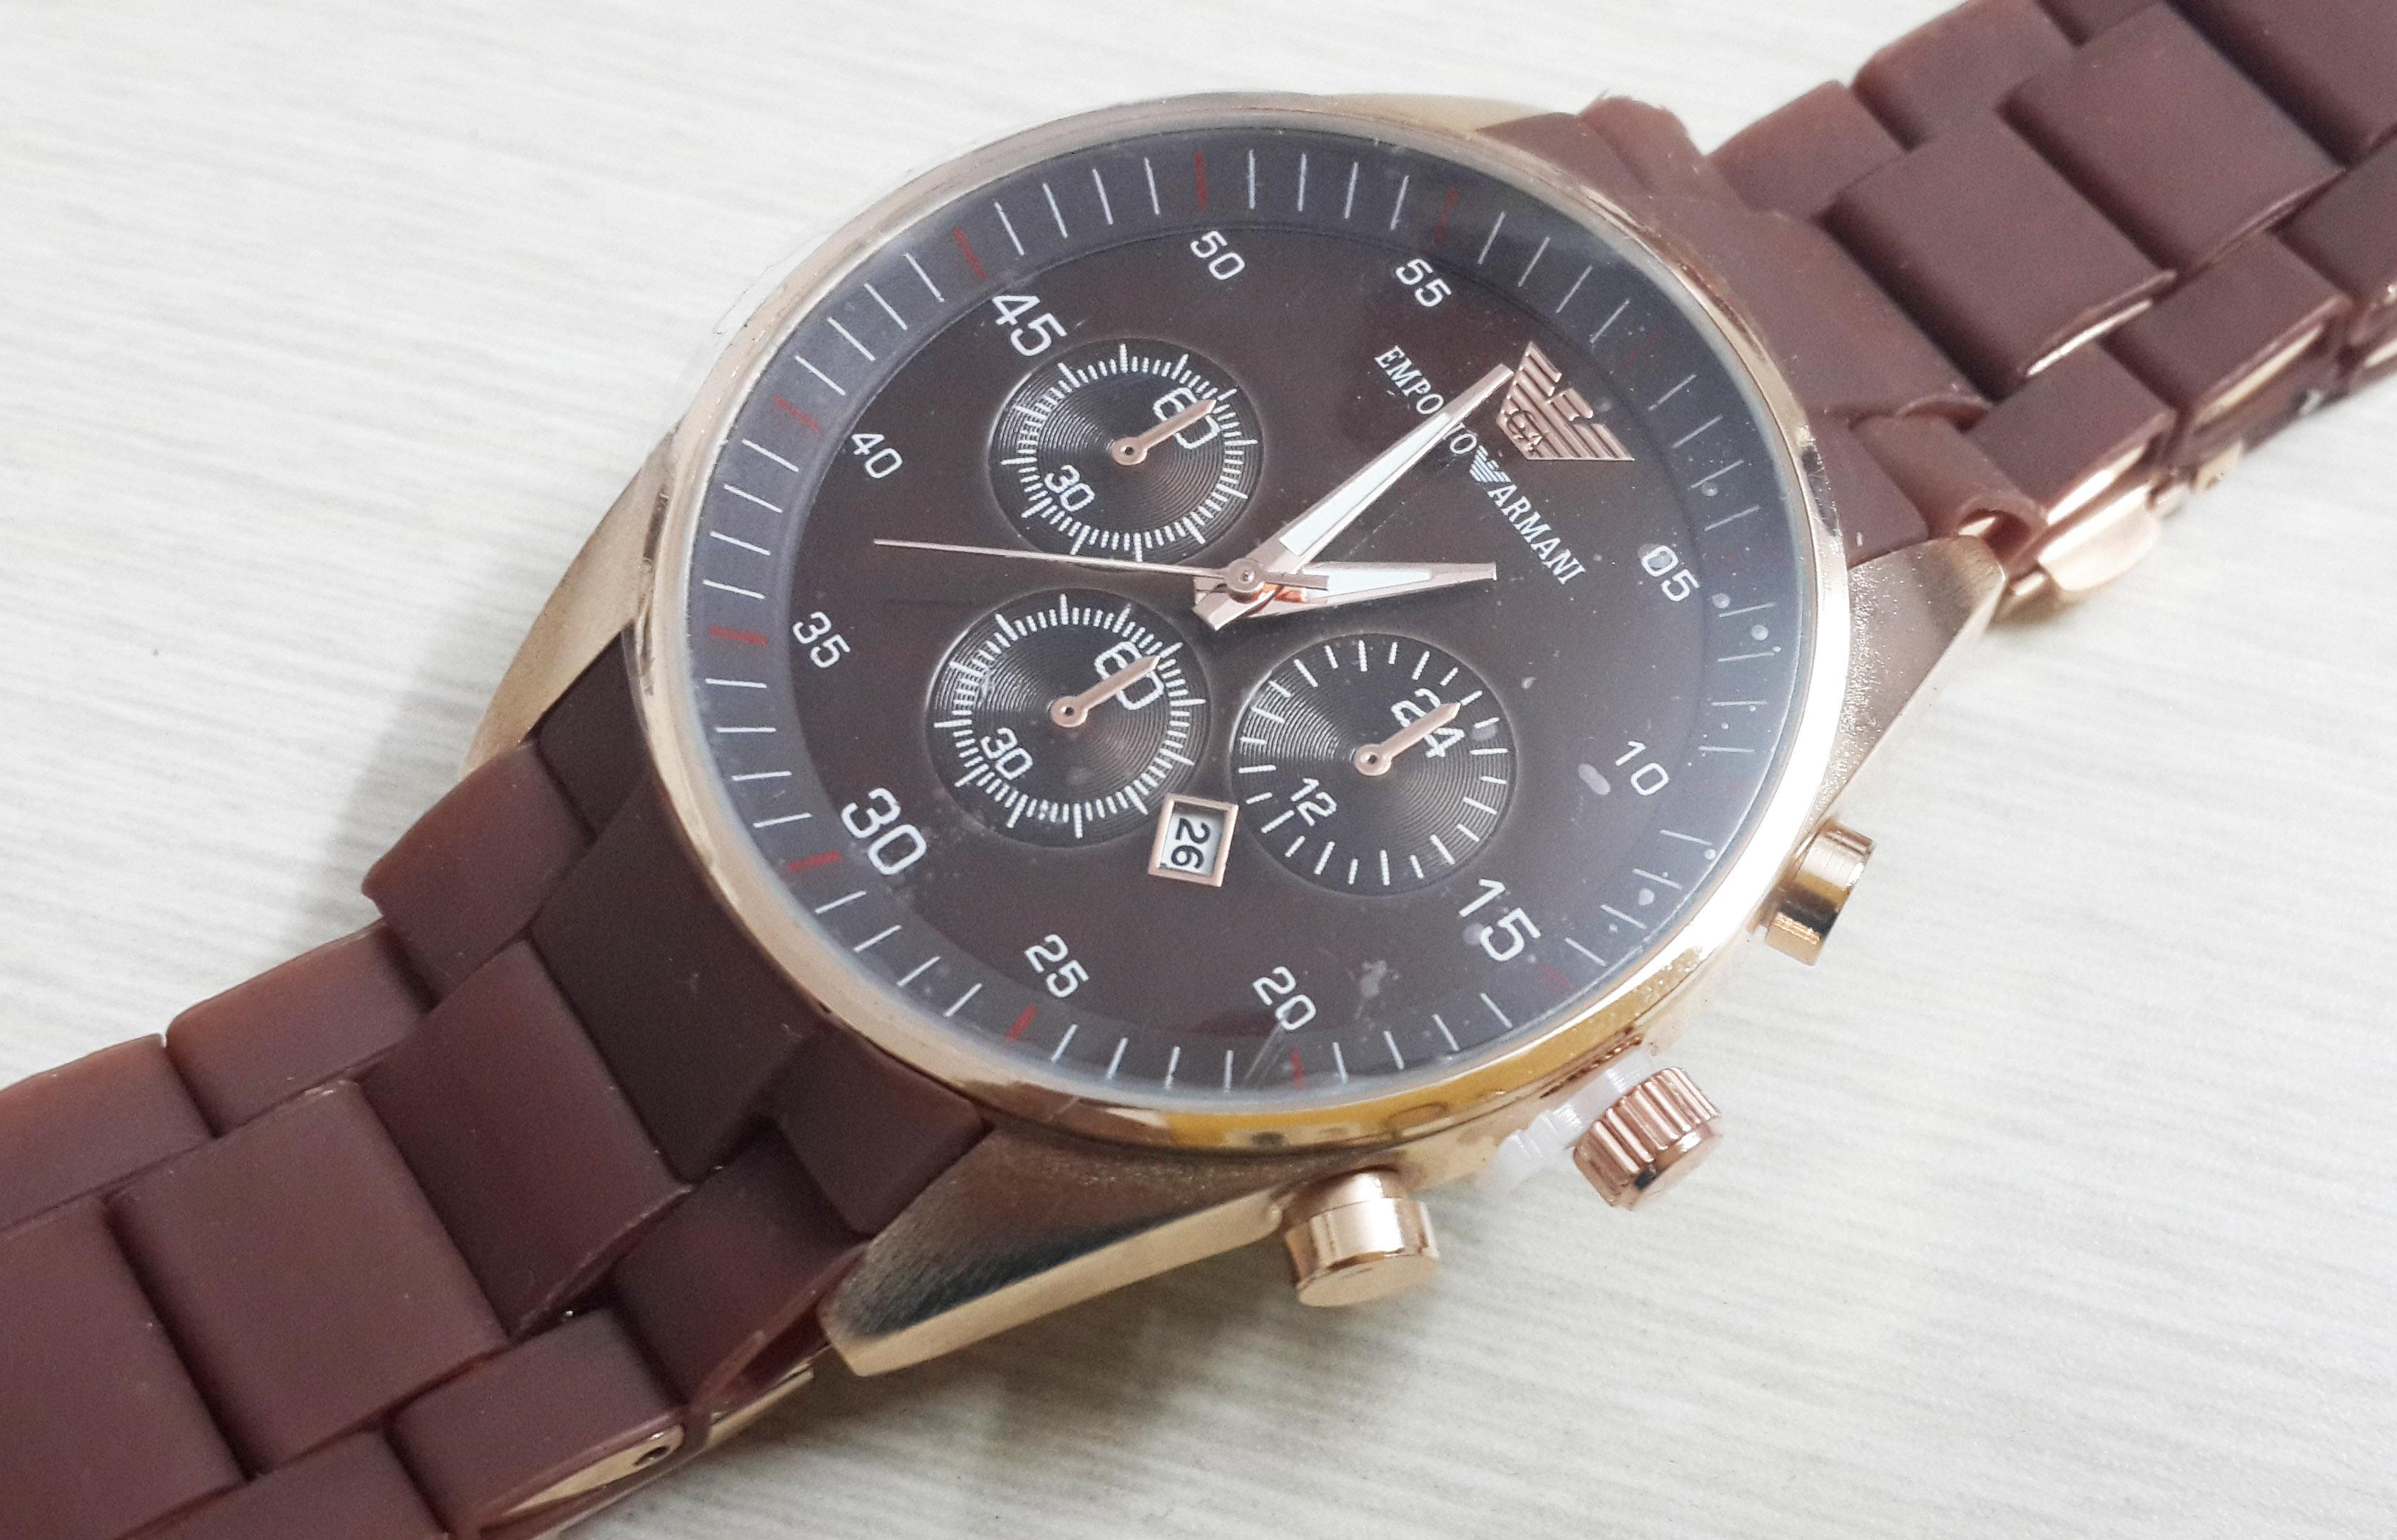 emporio armani watch ar5905 price in india будет лучше